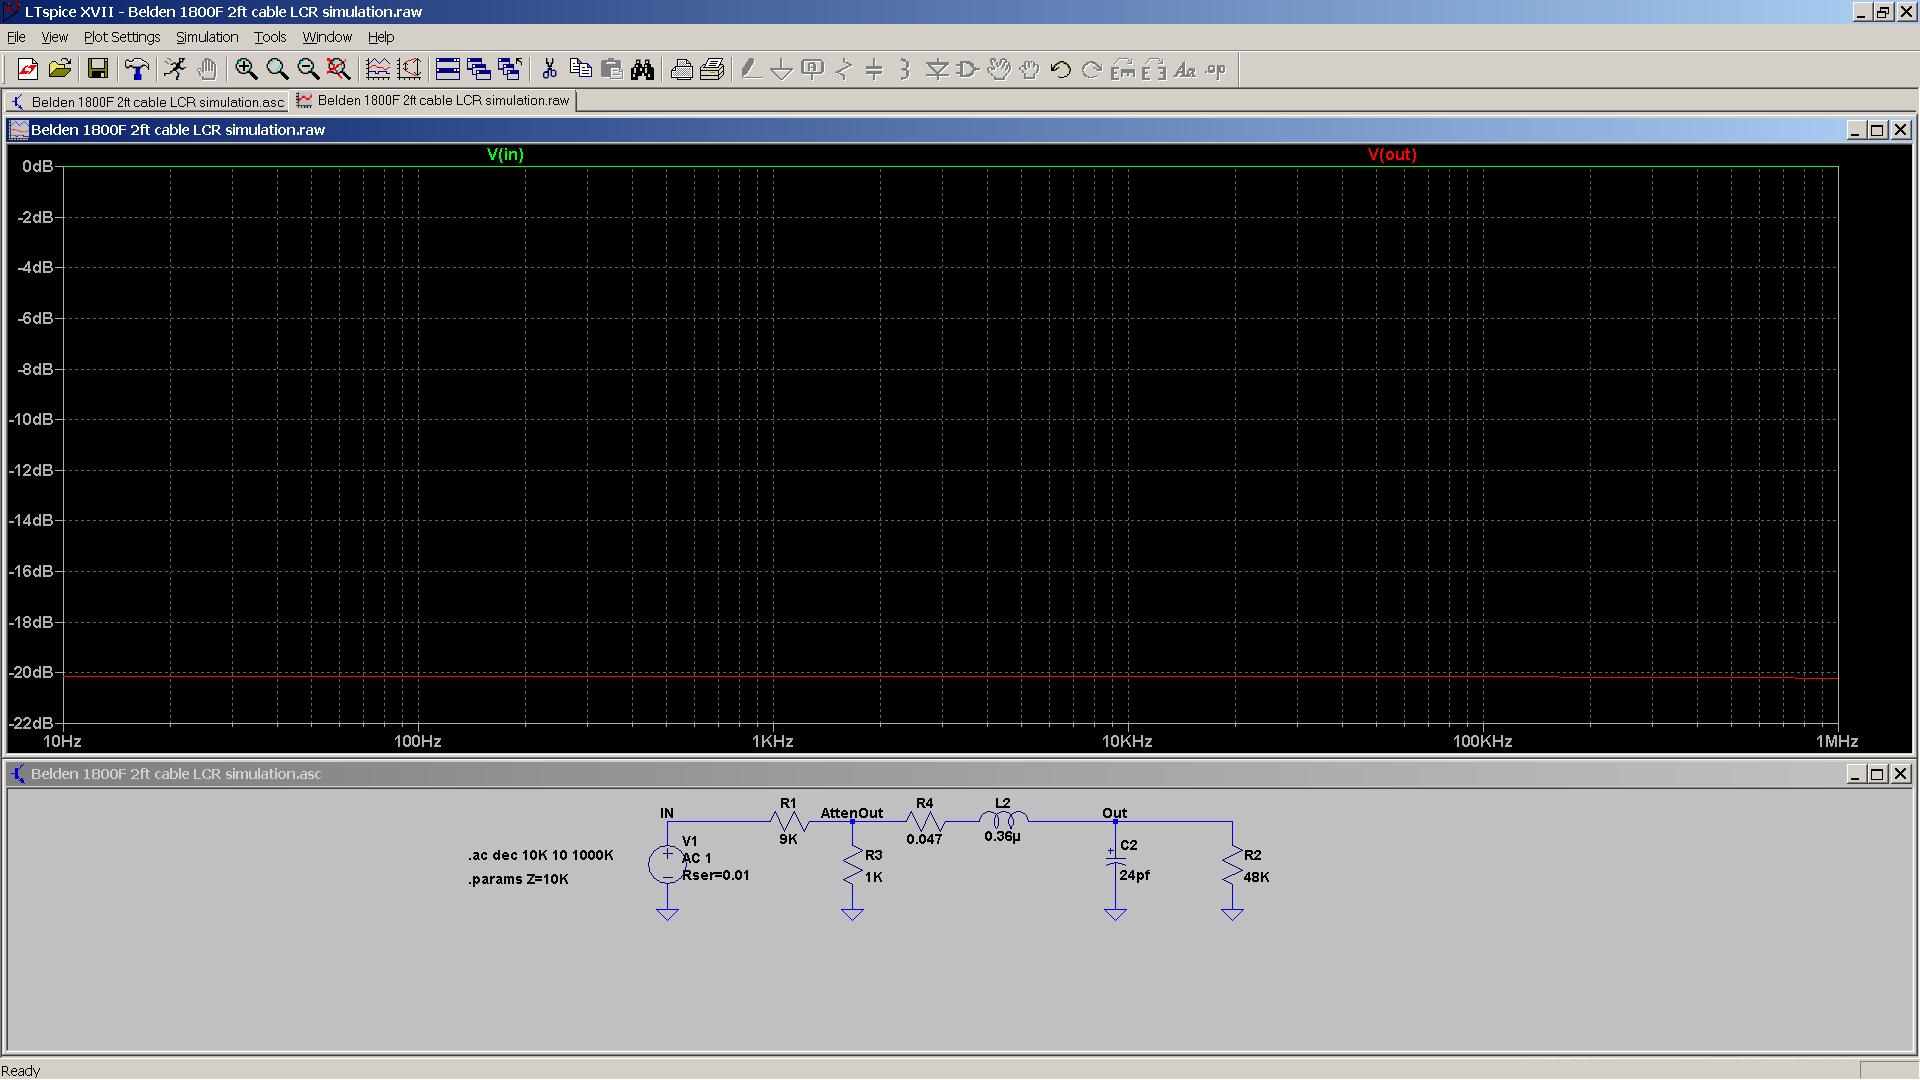 14 20190106 SA2X Belden 1800F 2ft Liquid Platinum load - 20 dB attenuation - overview.png